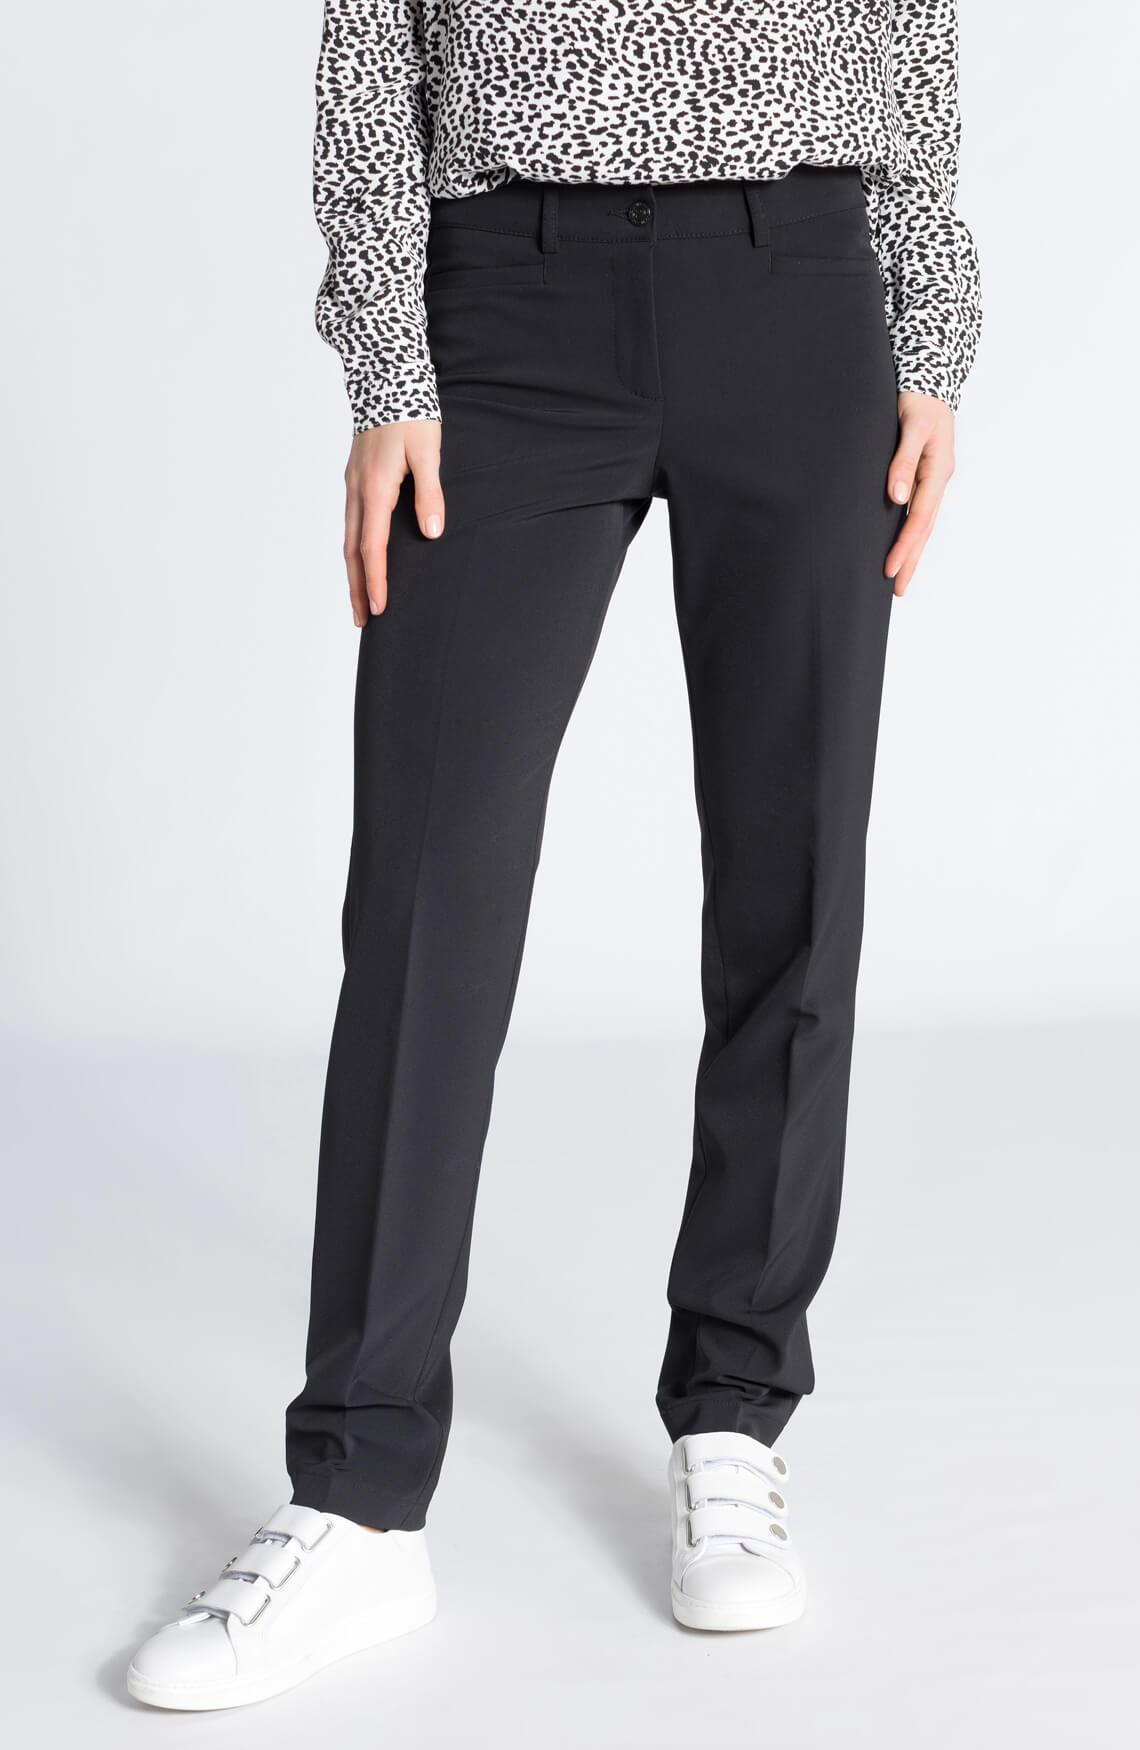 Cambio Dames Renira pantalon zwart zwart